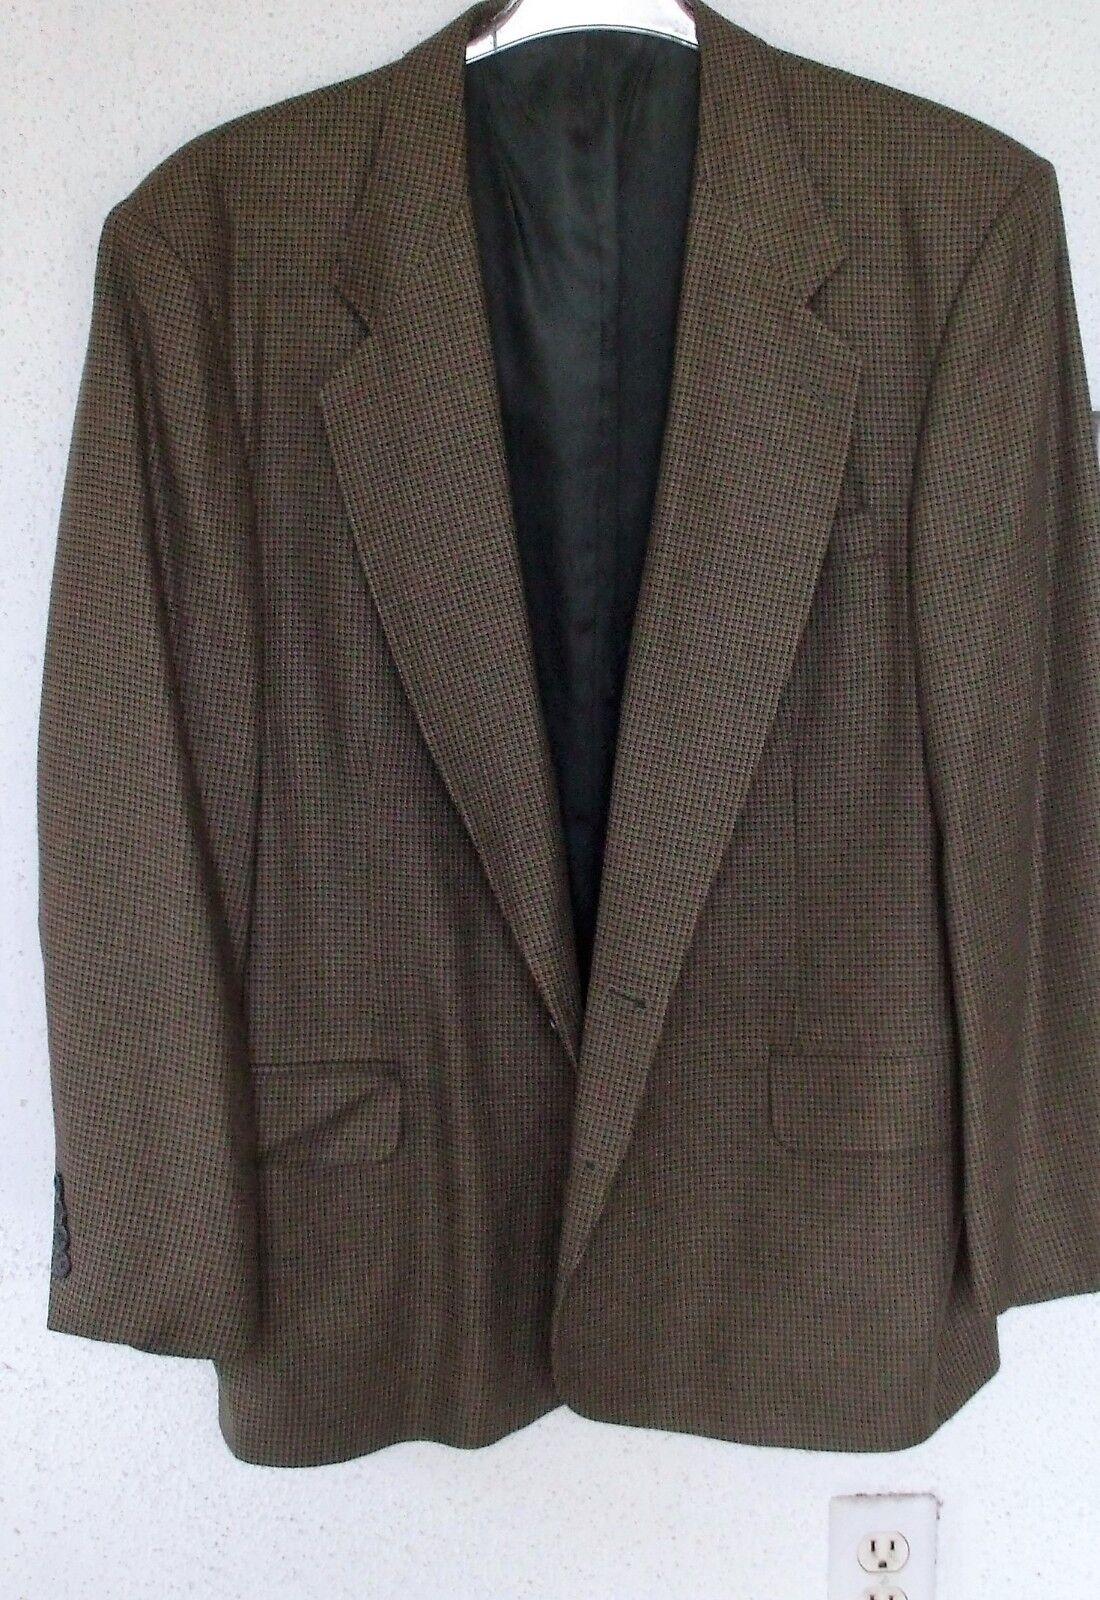 MEN'S SPORT COAT Size 46 Regular HOUNDS-TOOTH Italian Fabric Stunning